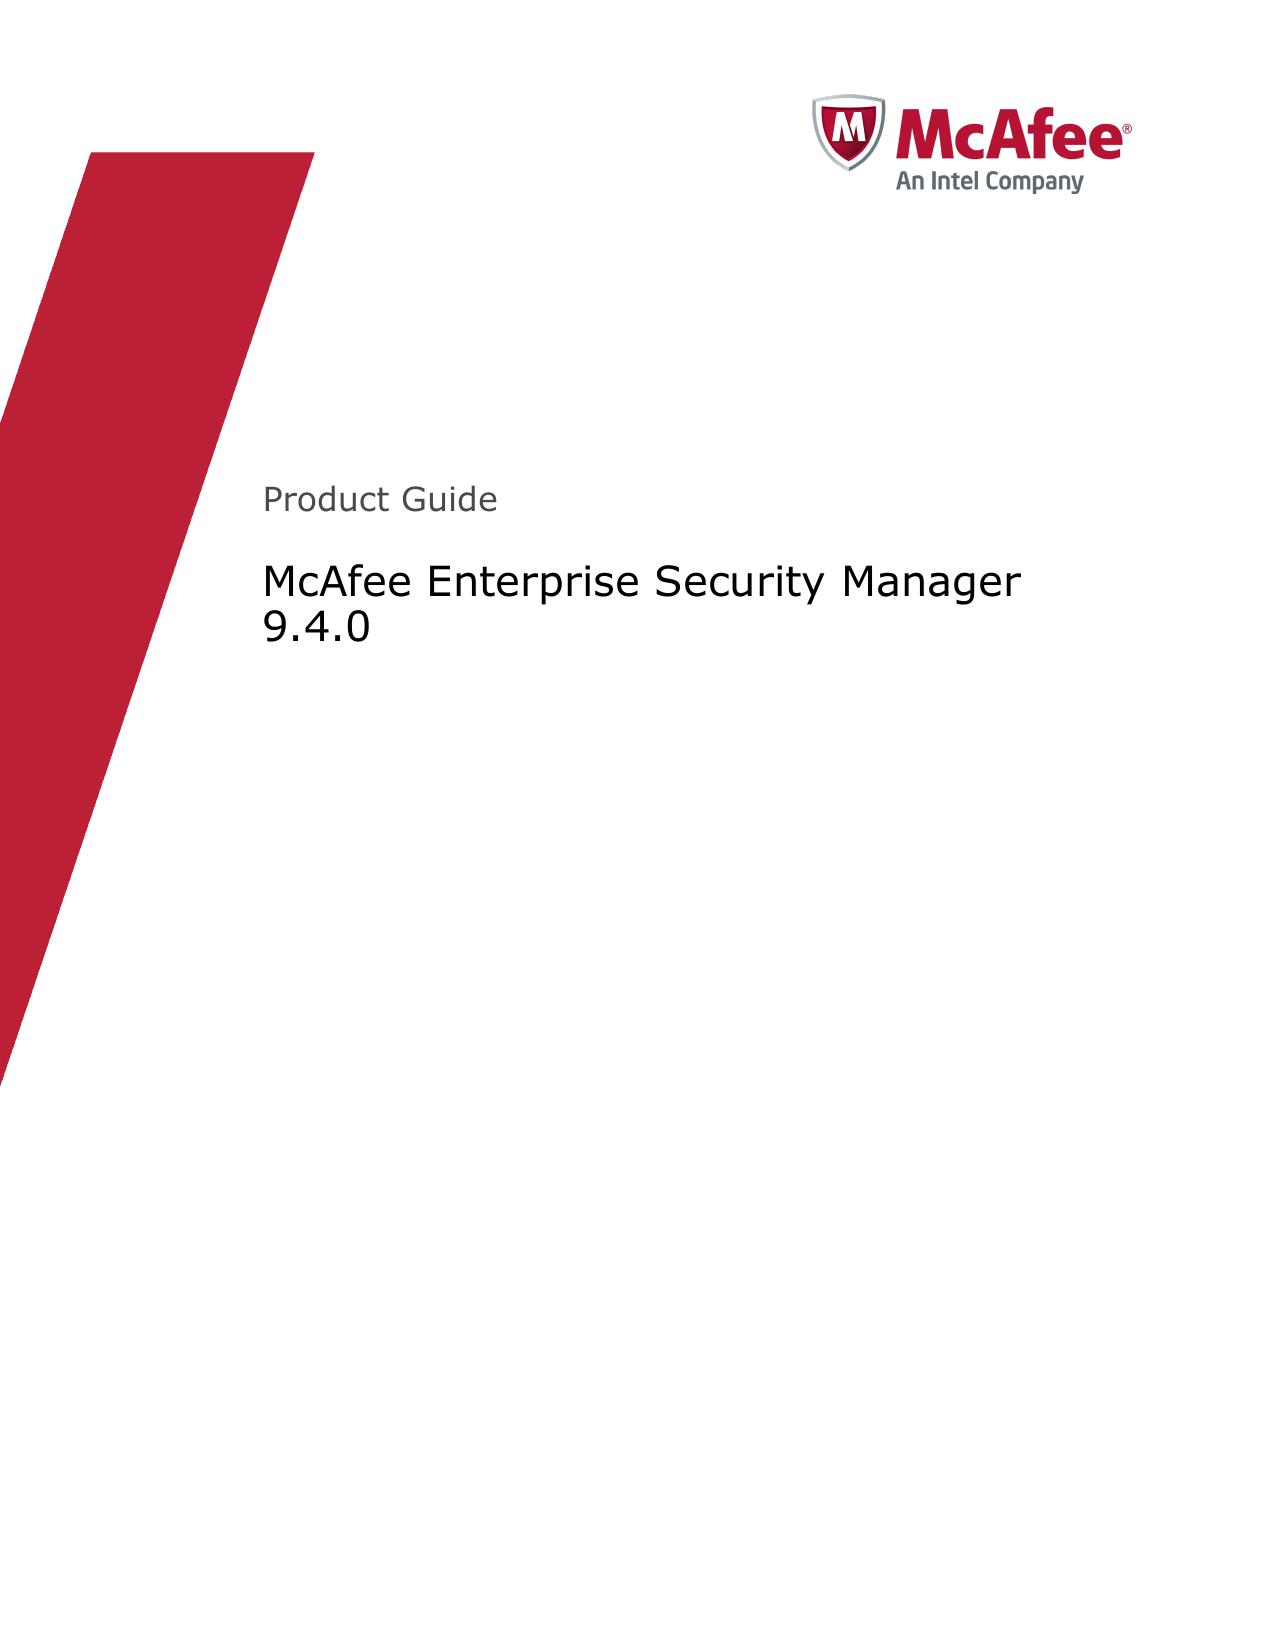 Enterprise Security Manager 9 4 0 Product Guide   manualzz com